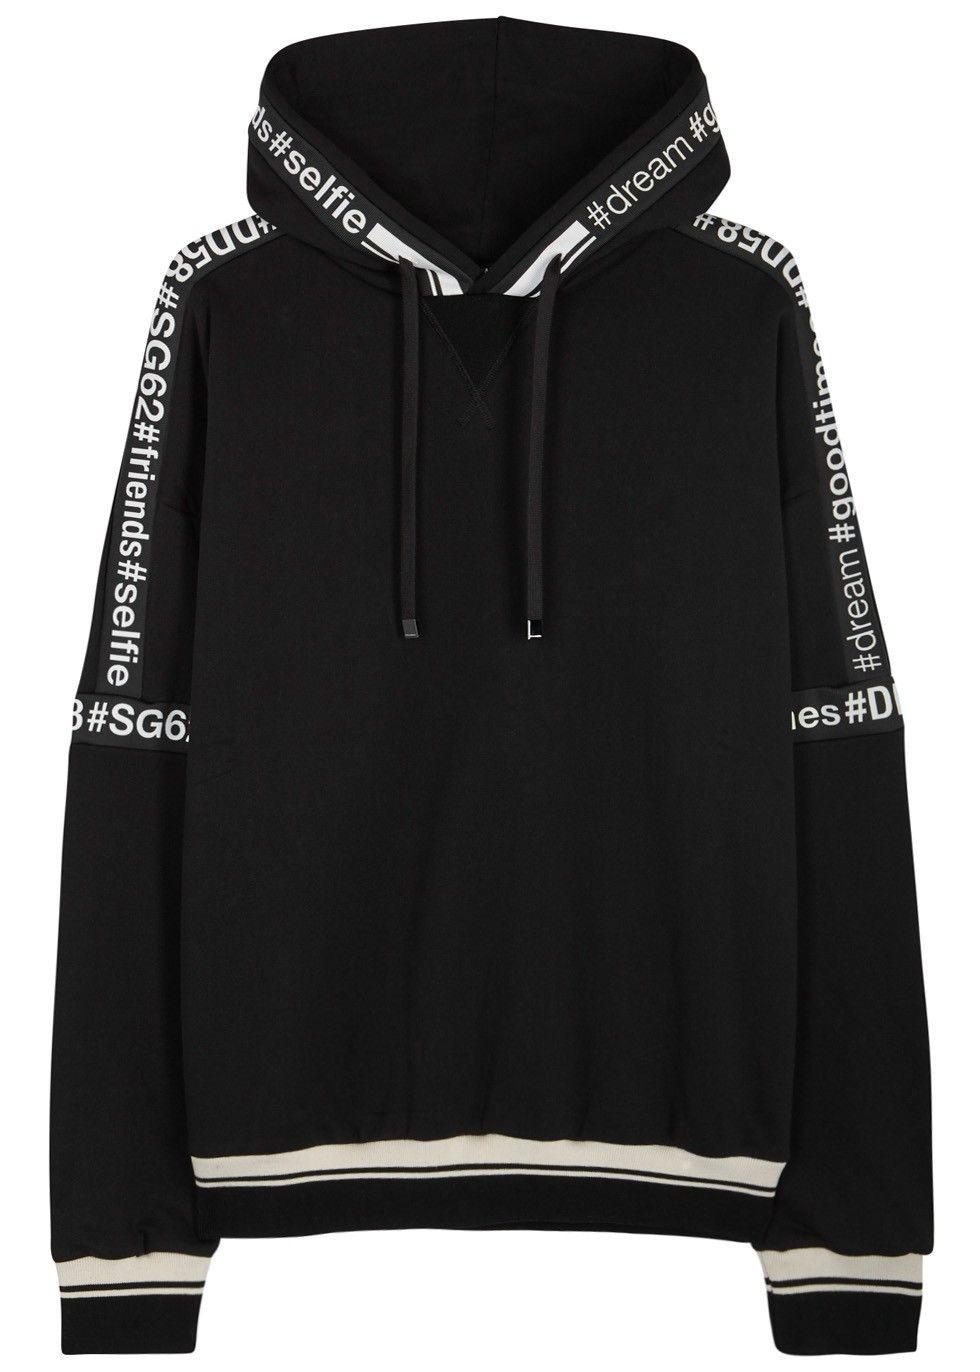 Pin By Nick On Mens Sweatshirts Hoodie Fashion Black Cotton Sweatshirt Sweatshirts [ 1372 x 980 Pixel ]